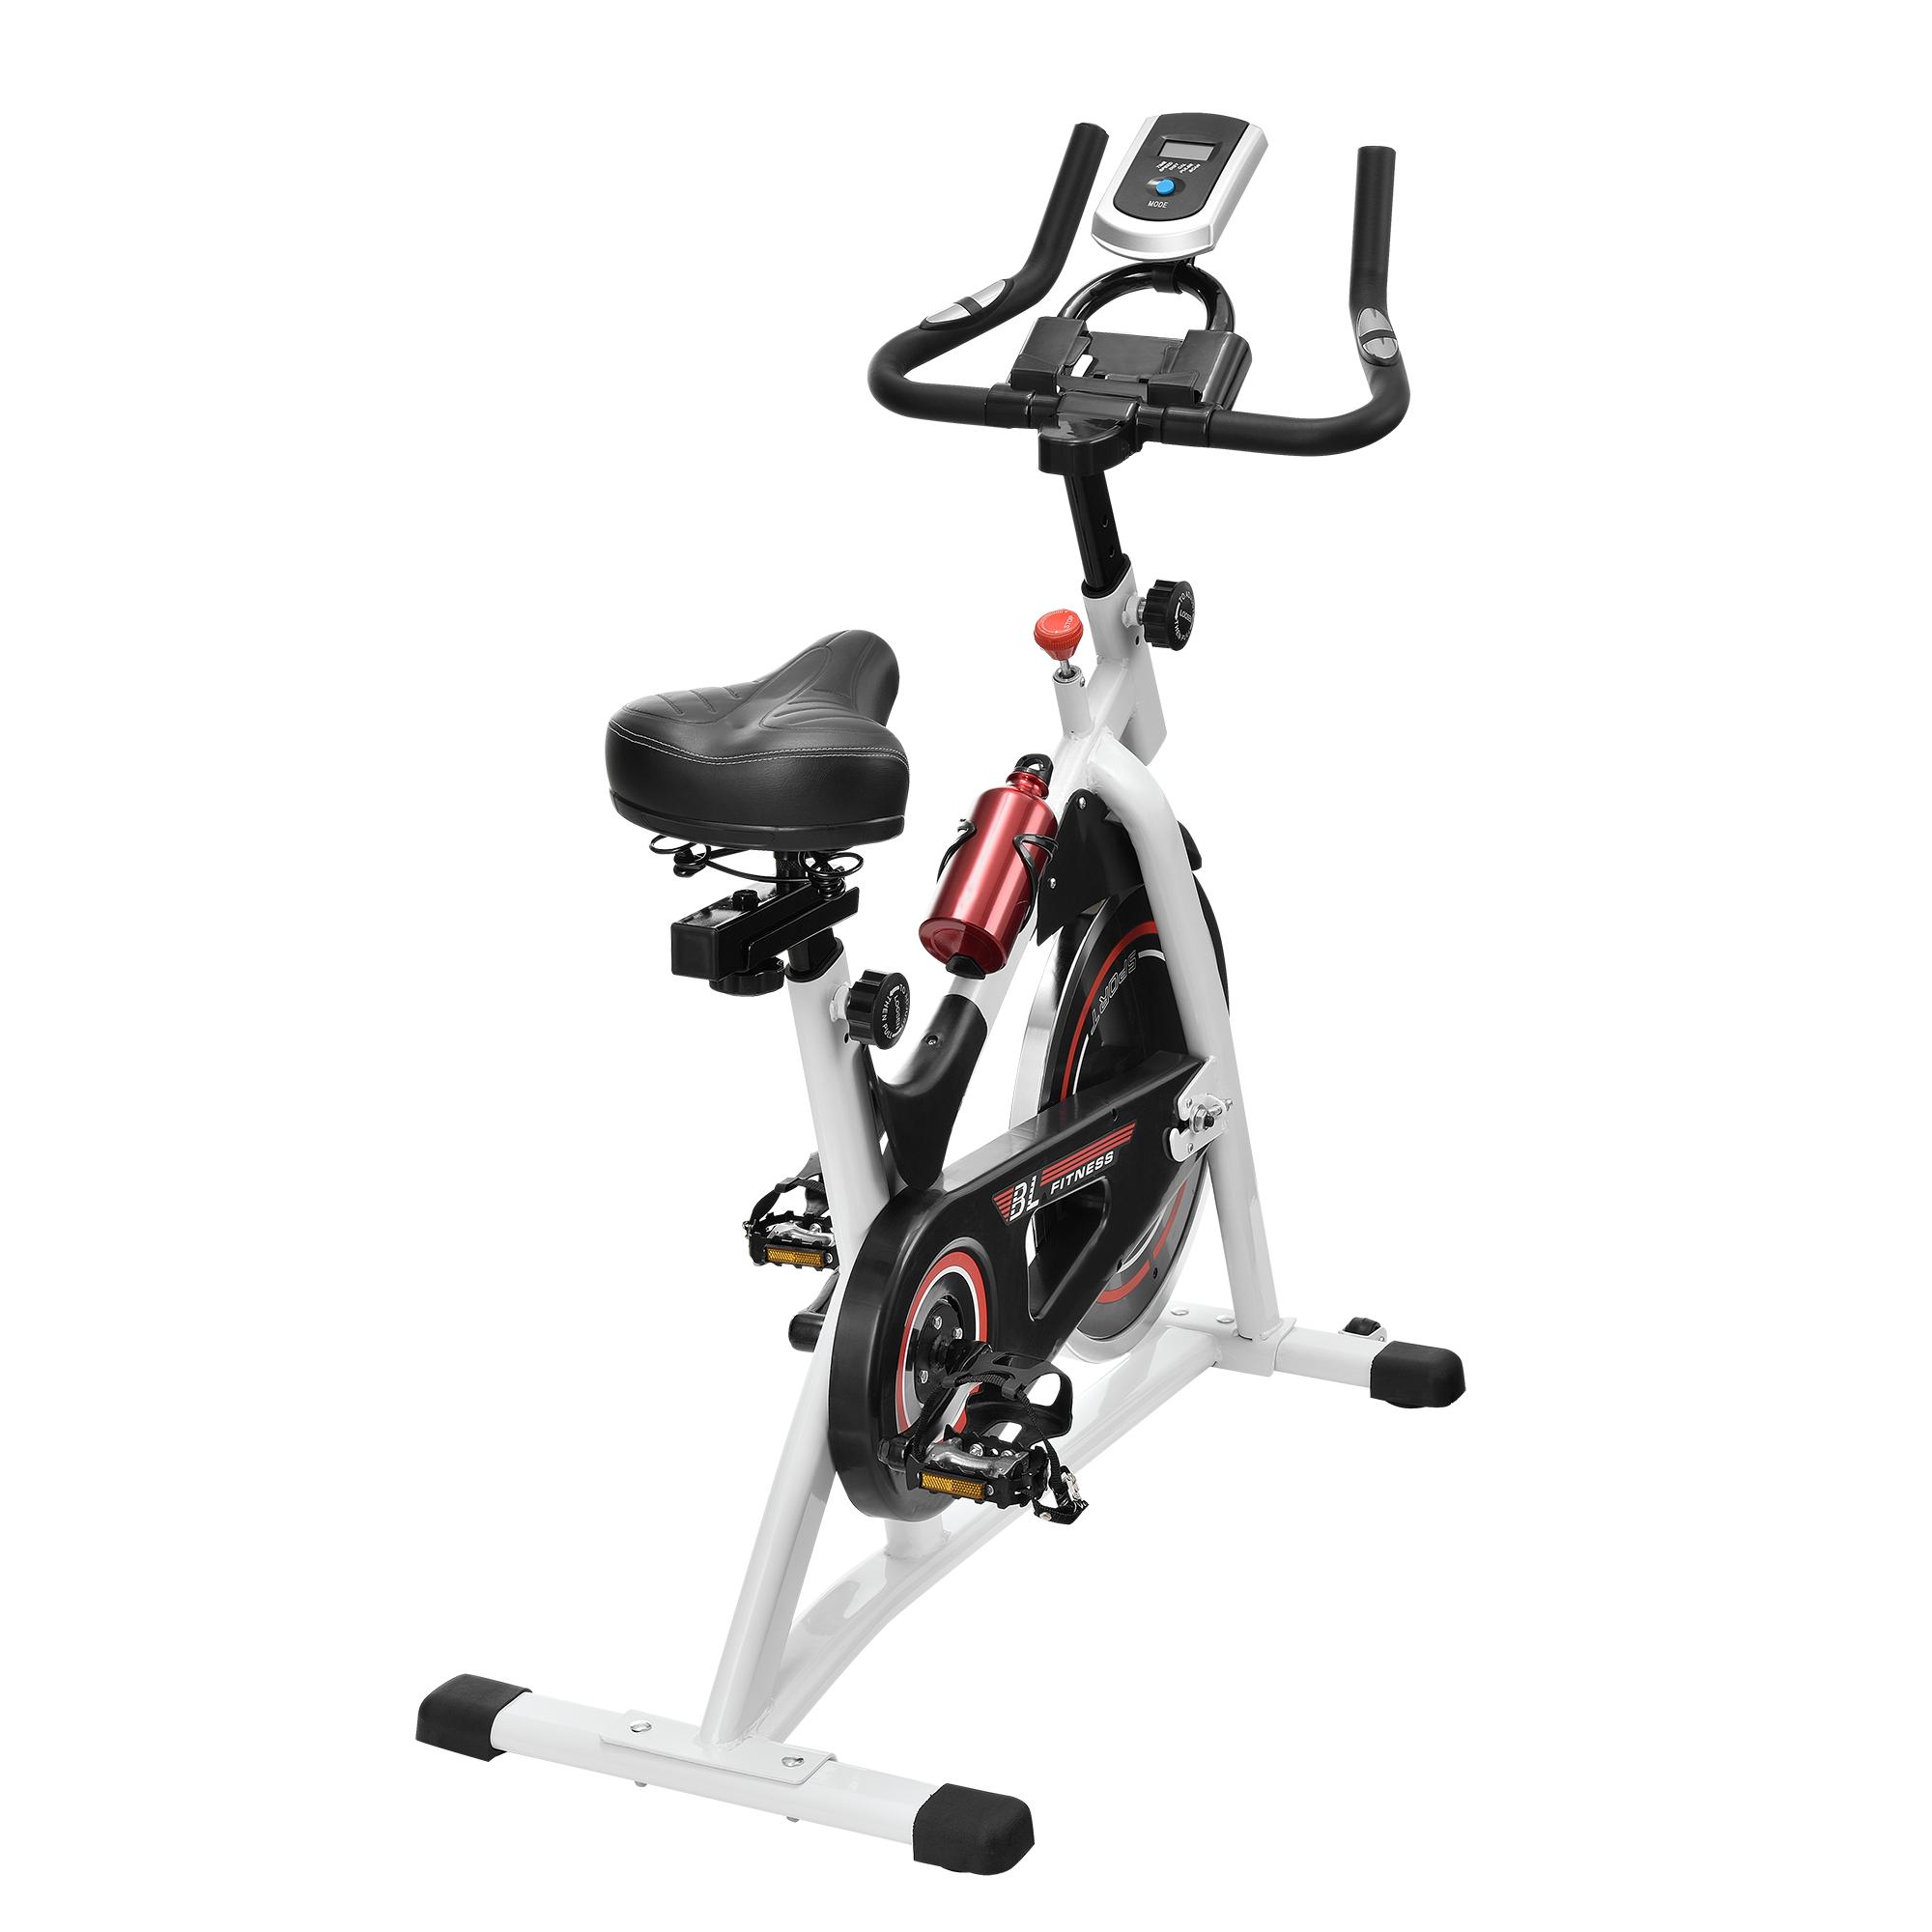 heimtrainer fahrrad fitness bike trimmrad indoor cycling rad sattel. Black Bedroom Furniture Sets. Home Design Ideas